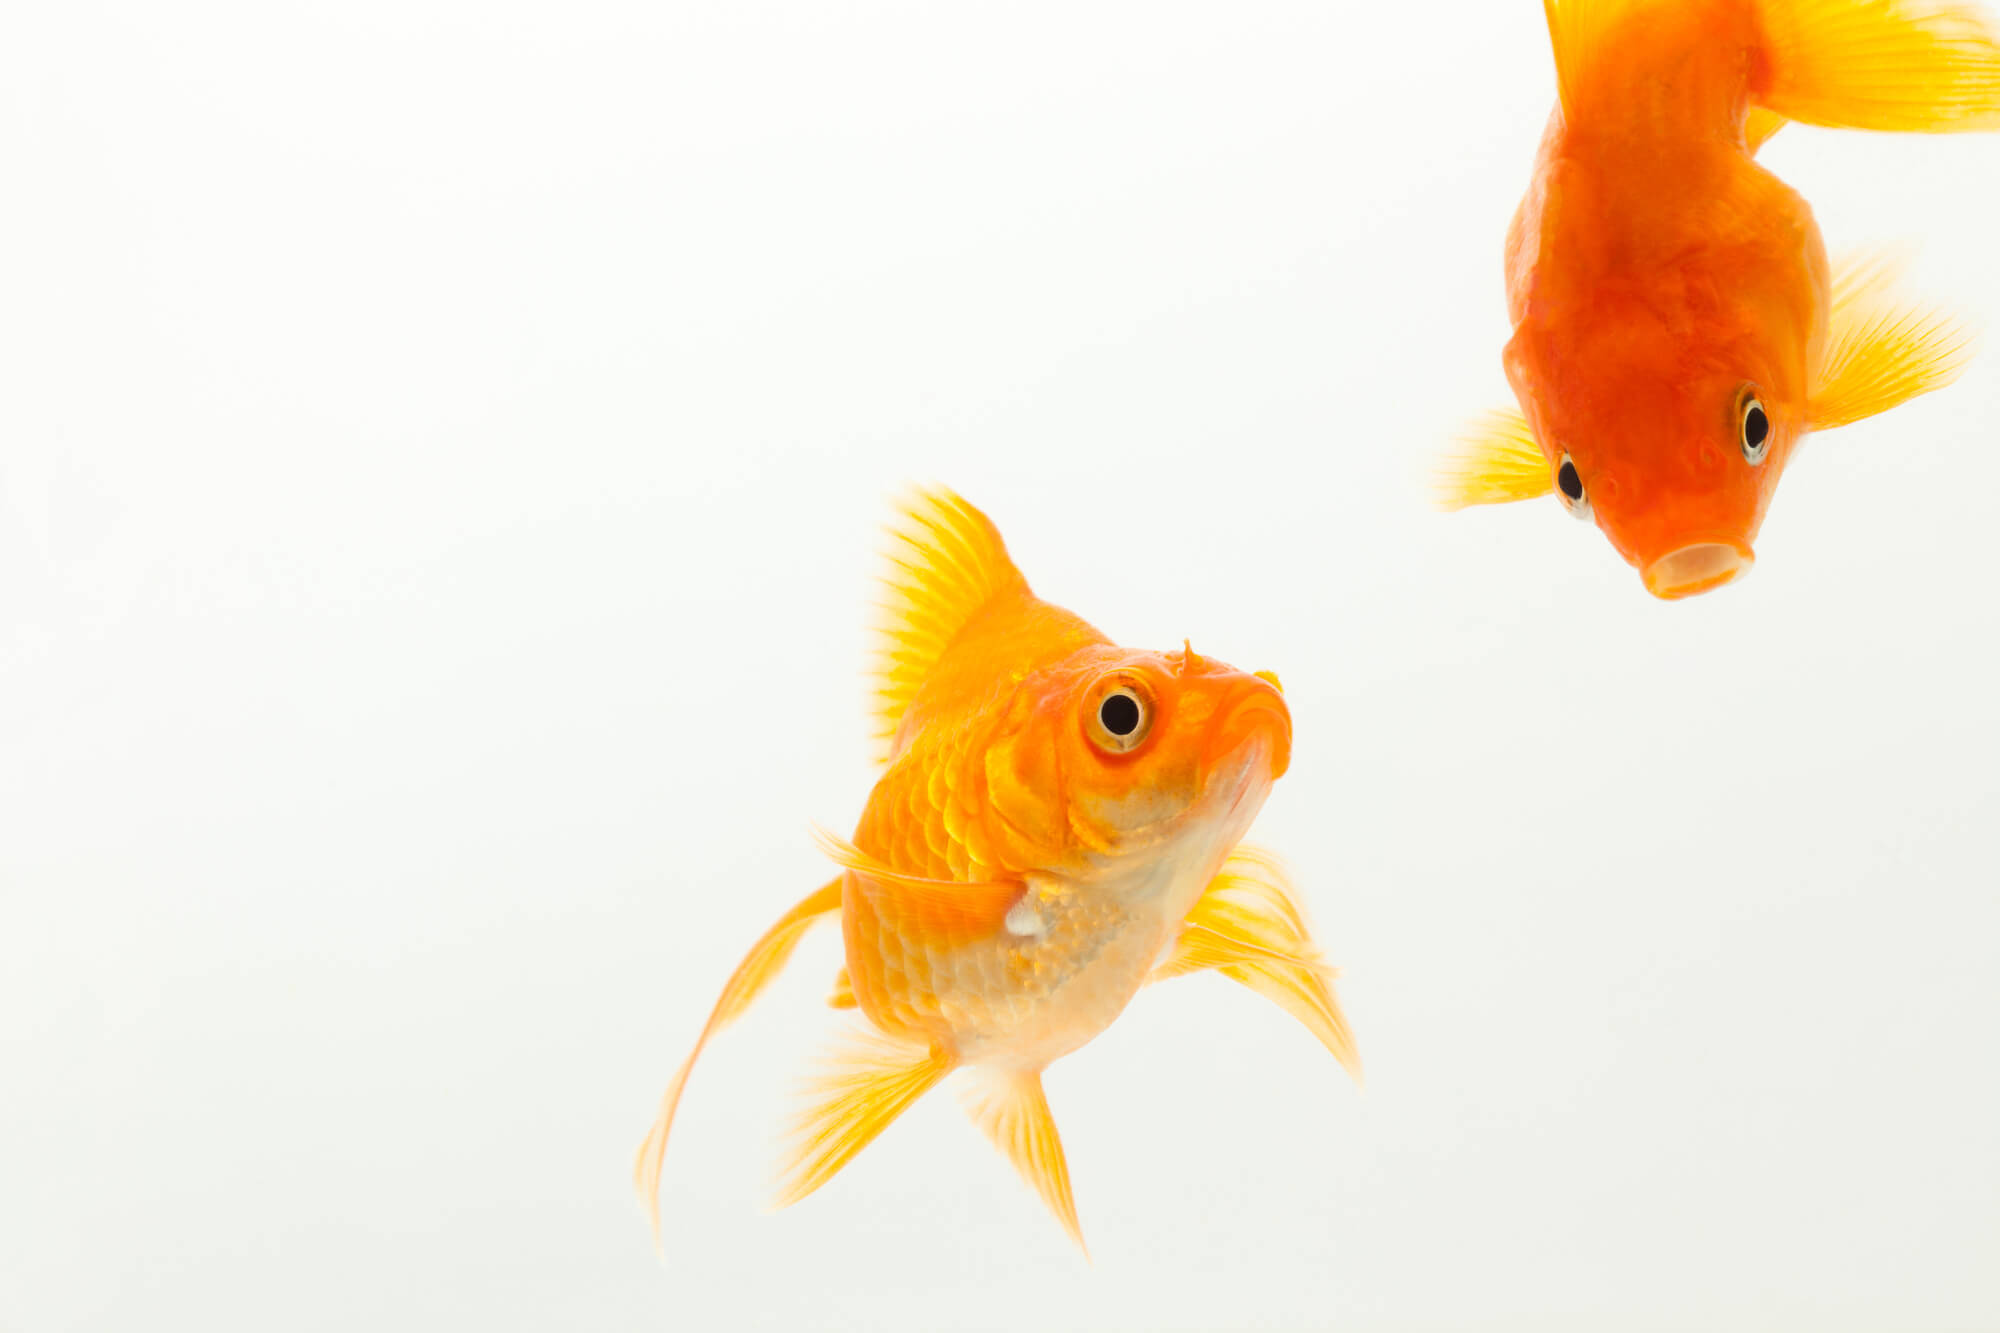 金魚の求愛行動